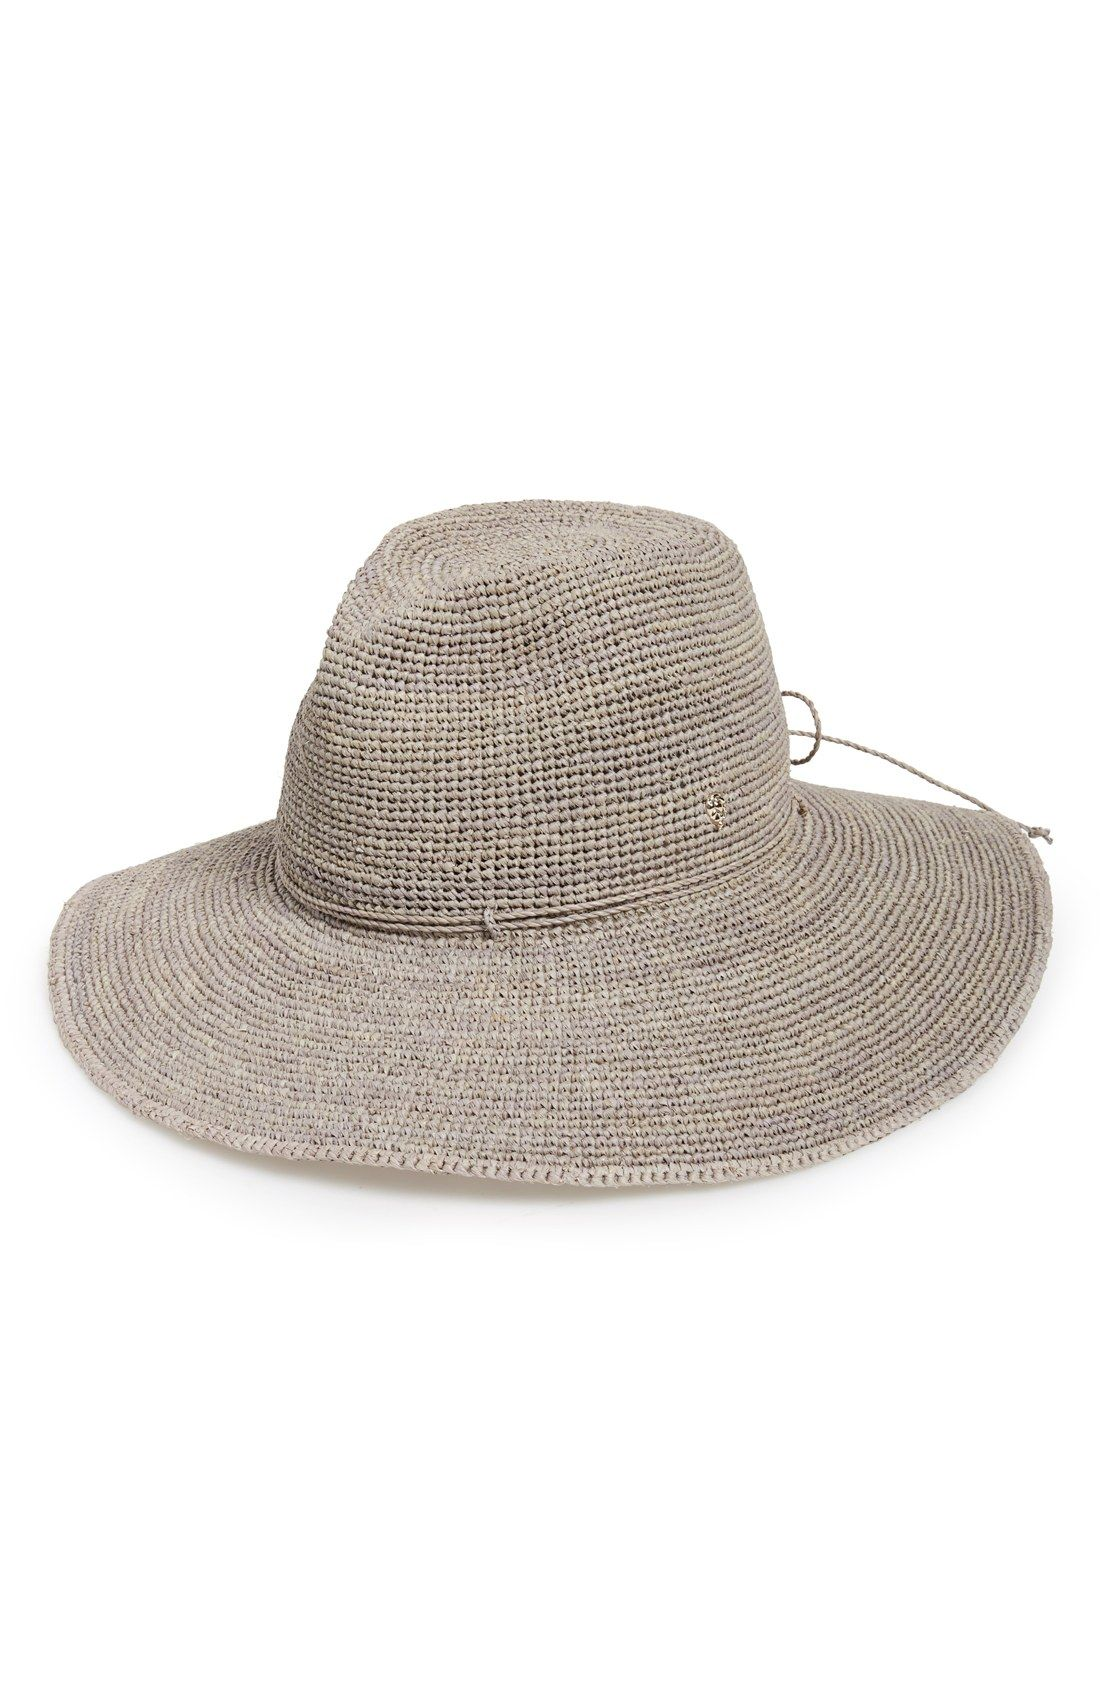 Helen Kaminski Raffia Crochet Packable Sun Hat | HATS \\\\ IDEAS ...